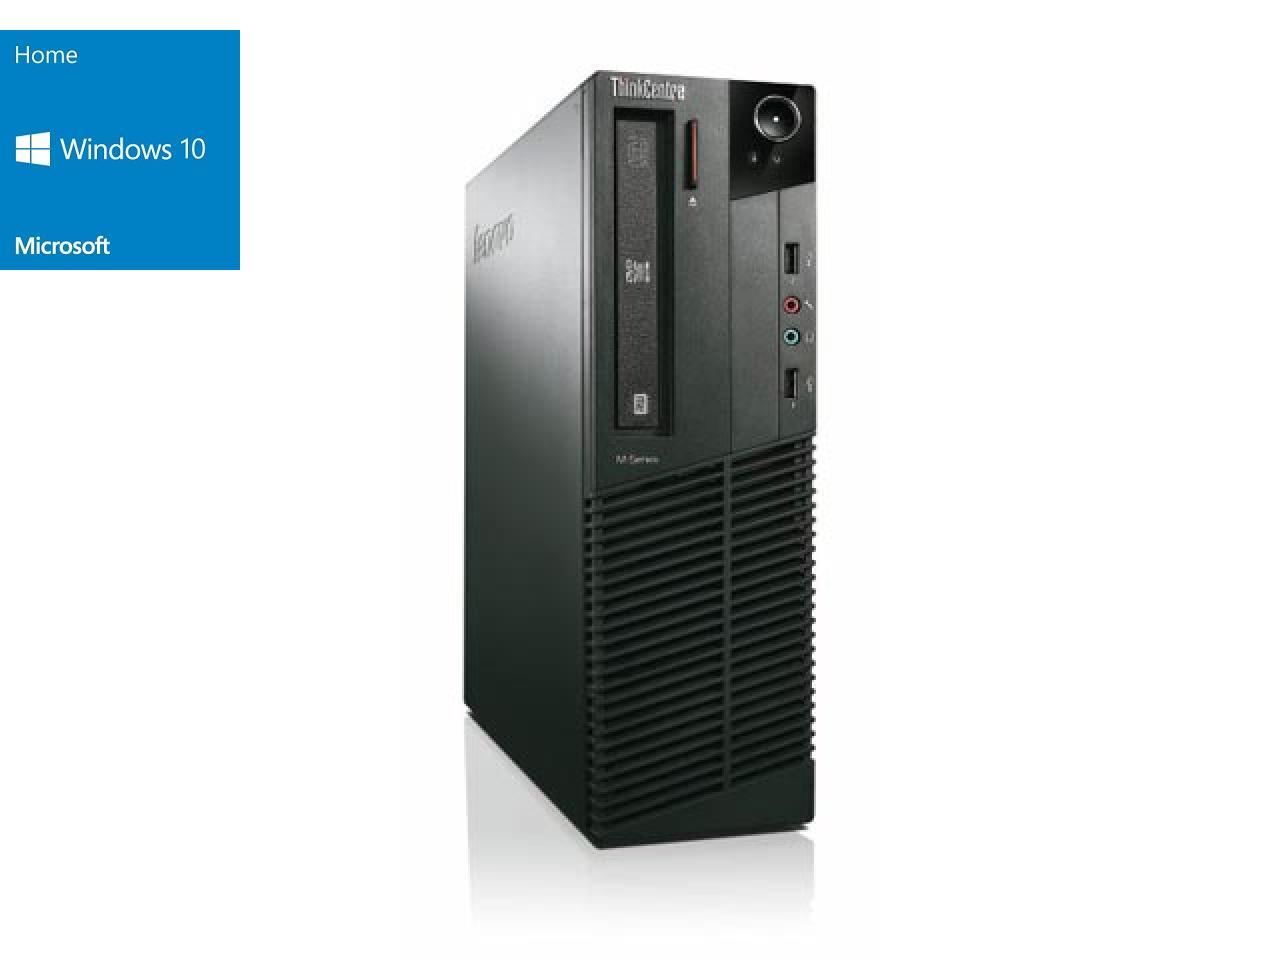 Lenovo ThinkCentre M92p SFF  - shop.bb-net.de